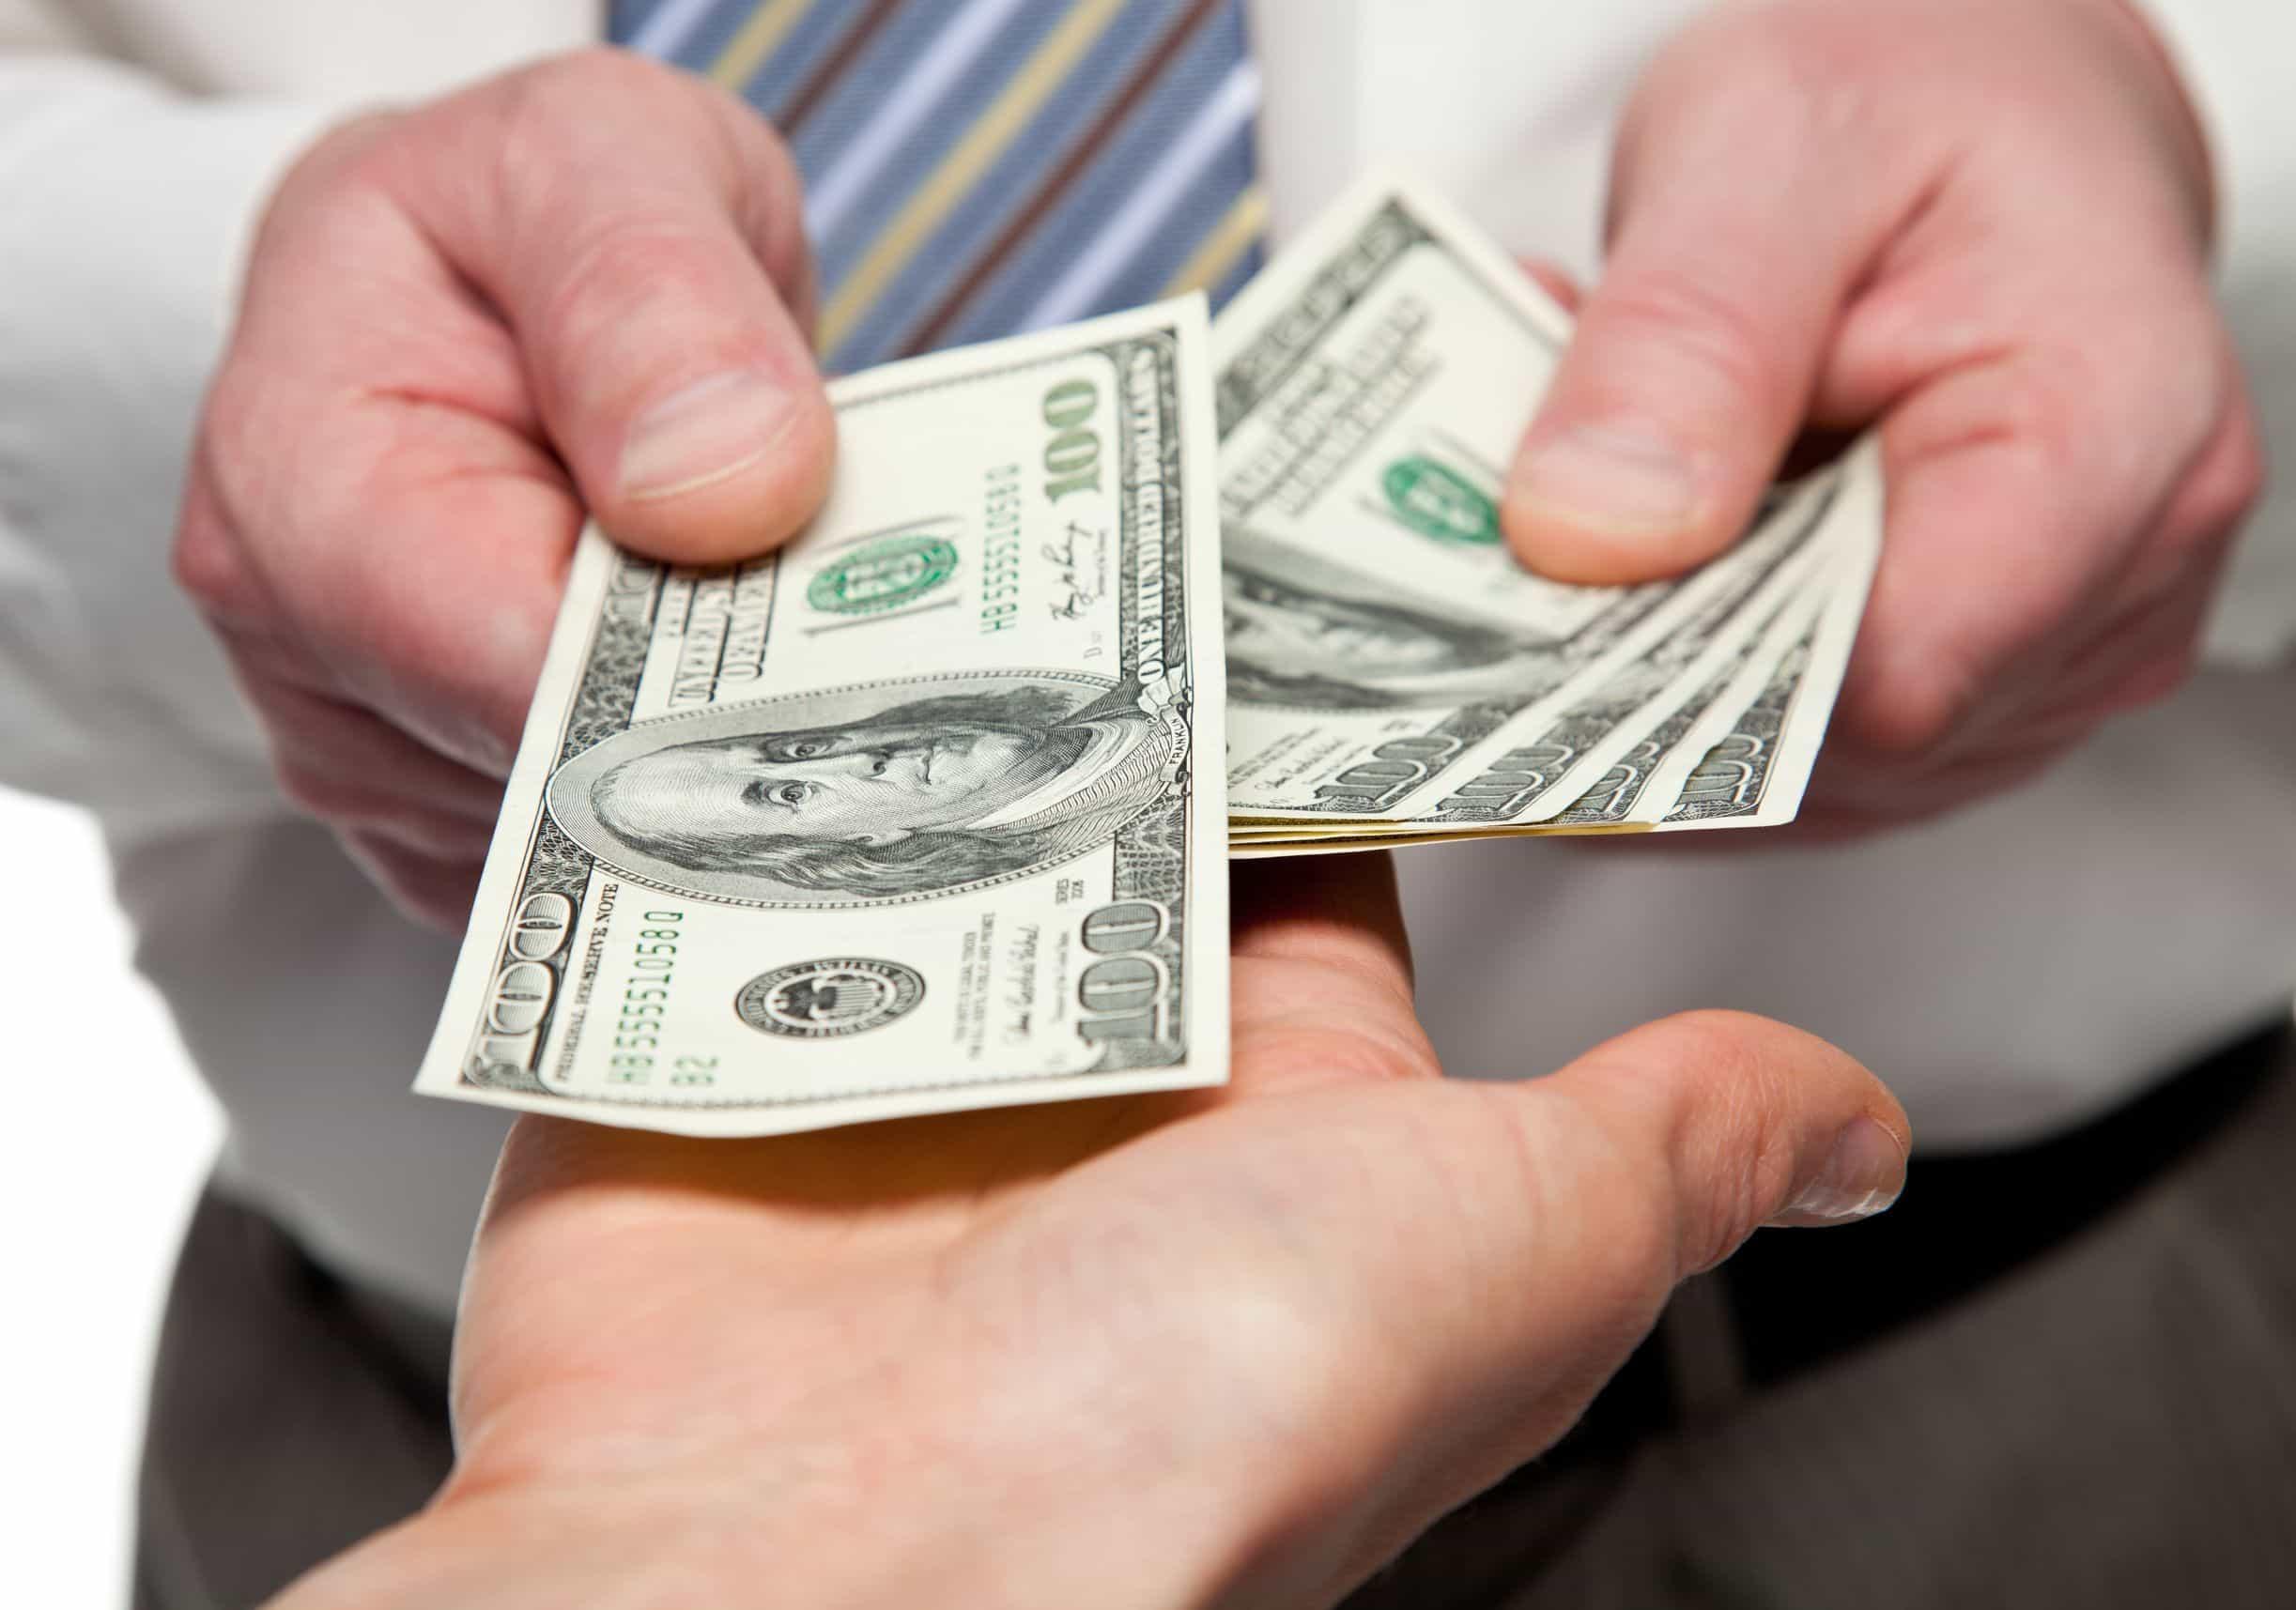 image of hands paling money